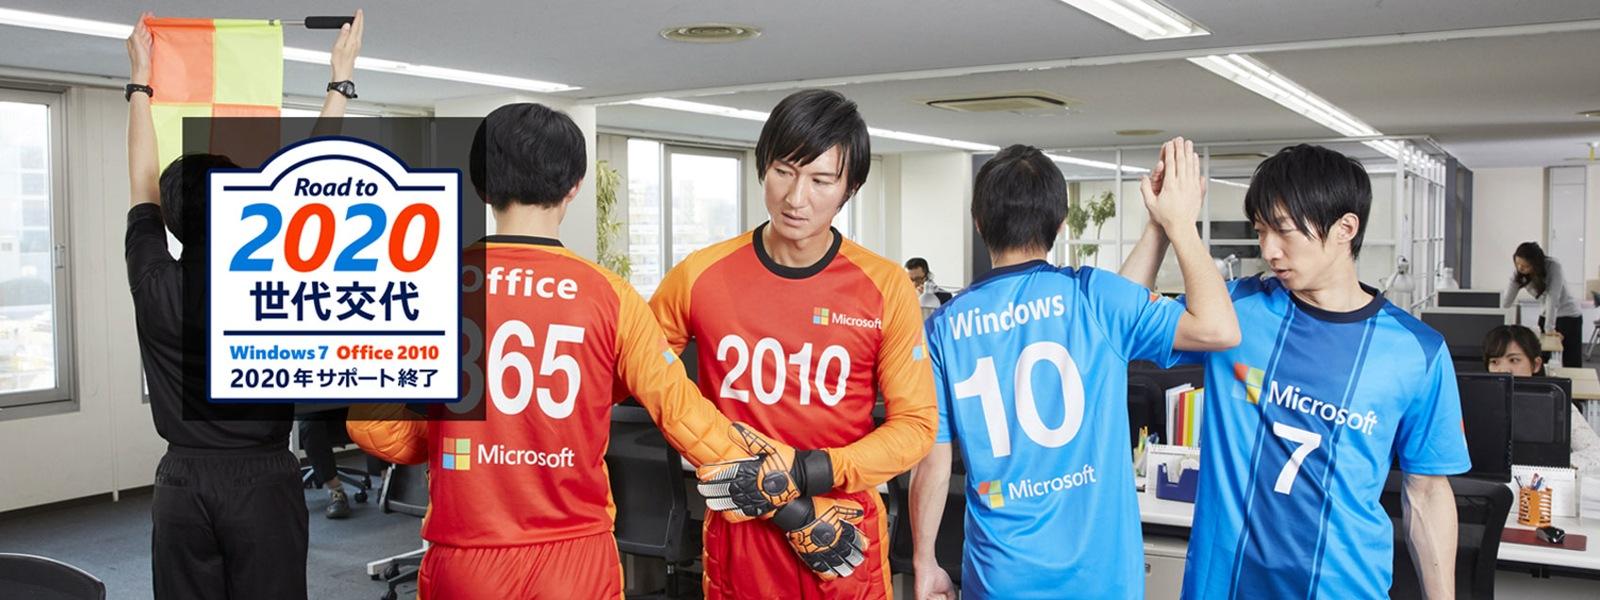 Road to 2020 世代交代。 Windows 7 Office 2010 2020年サポート終了。